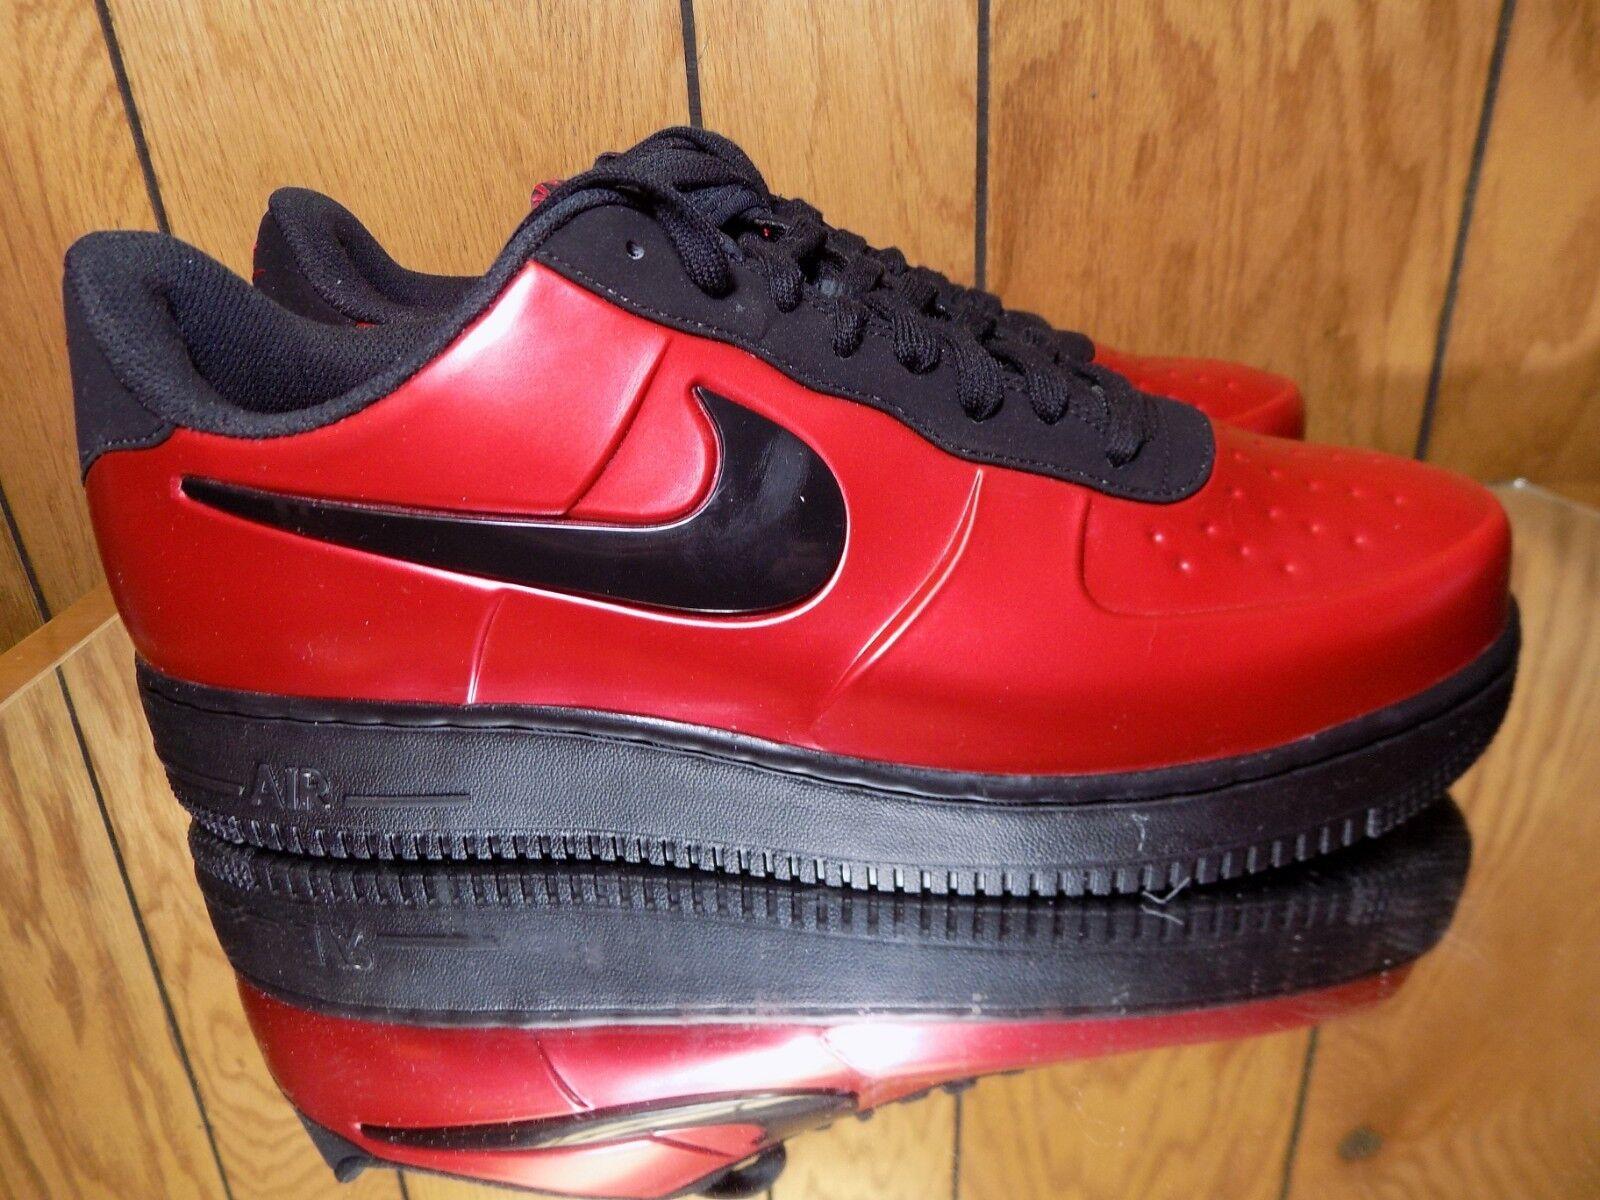 Nike air pegasus 89 scarpe femminili ghiacciaio 6,5 ghiacciaio femminili blue / co / nvy 844888 400 nuovi 8b7d57